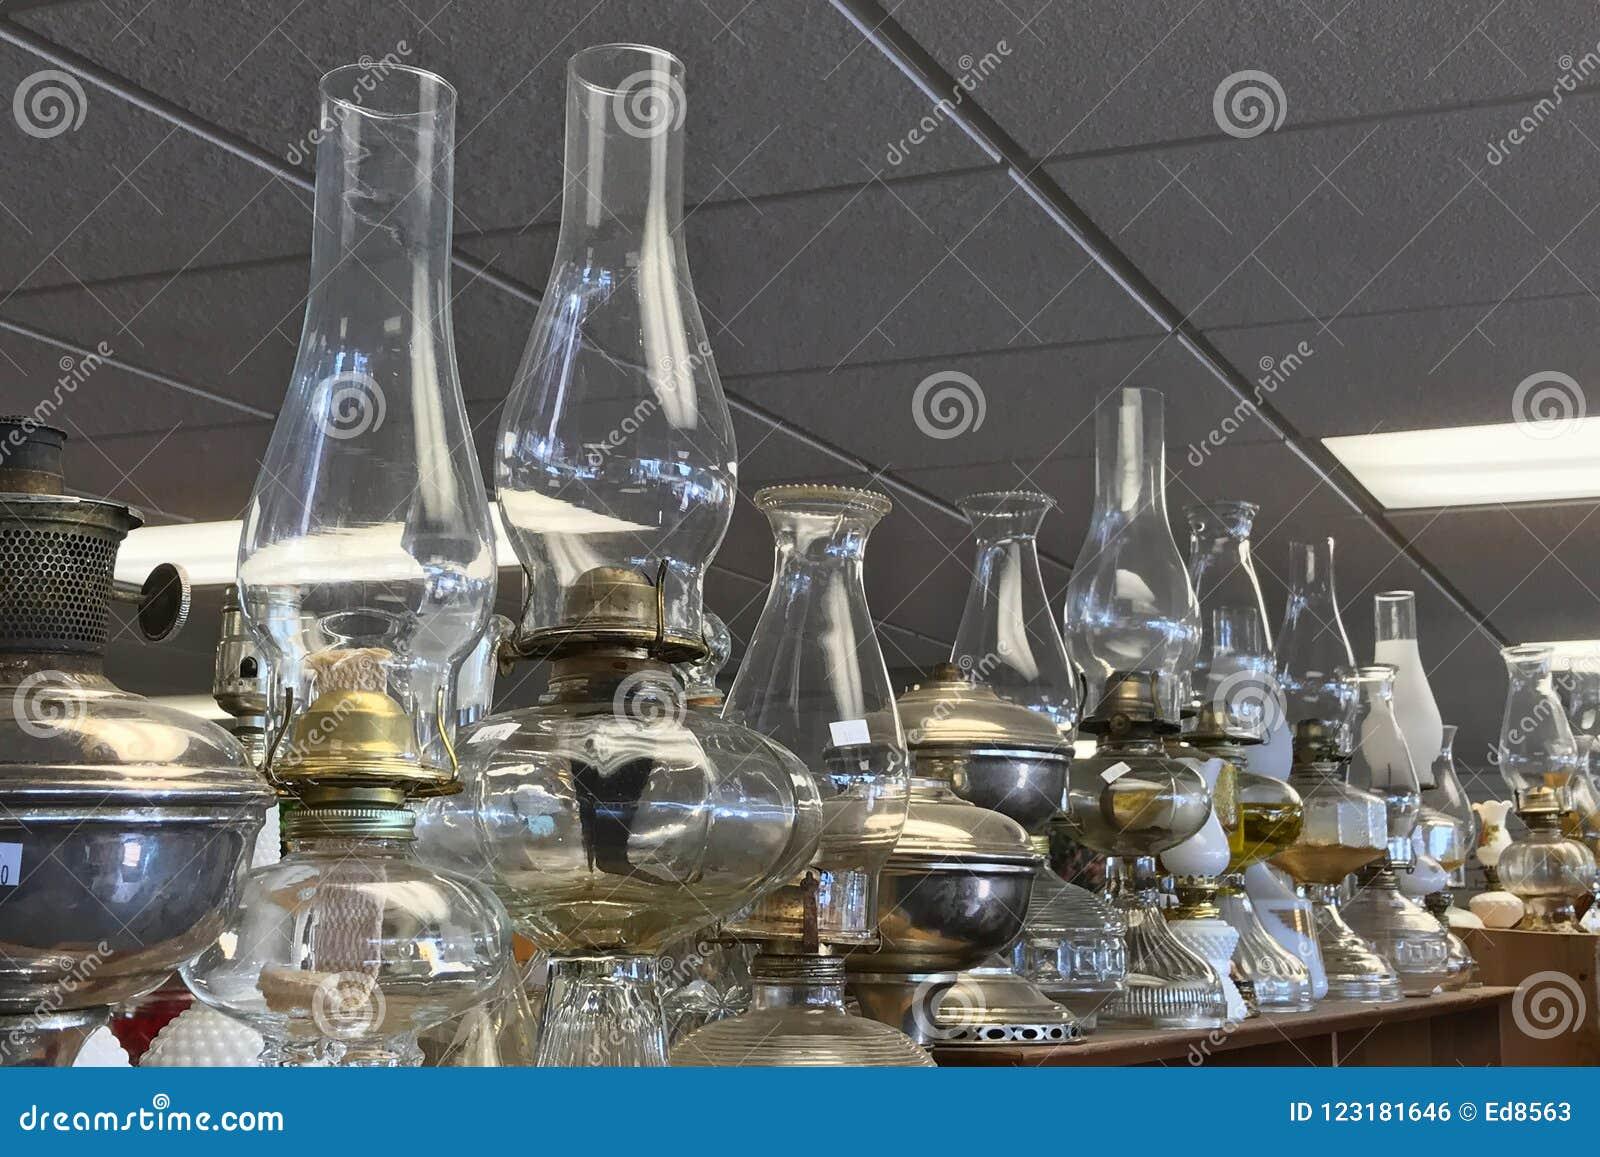 Kerosene Lamps Or Lanterns On A Shelf In A Thrift Store